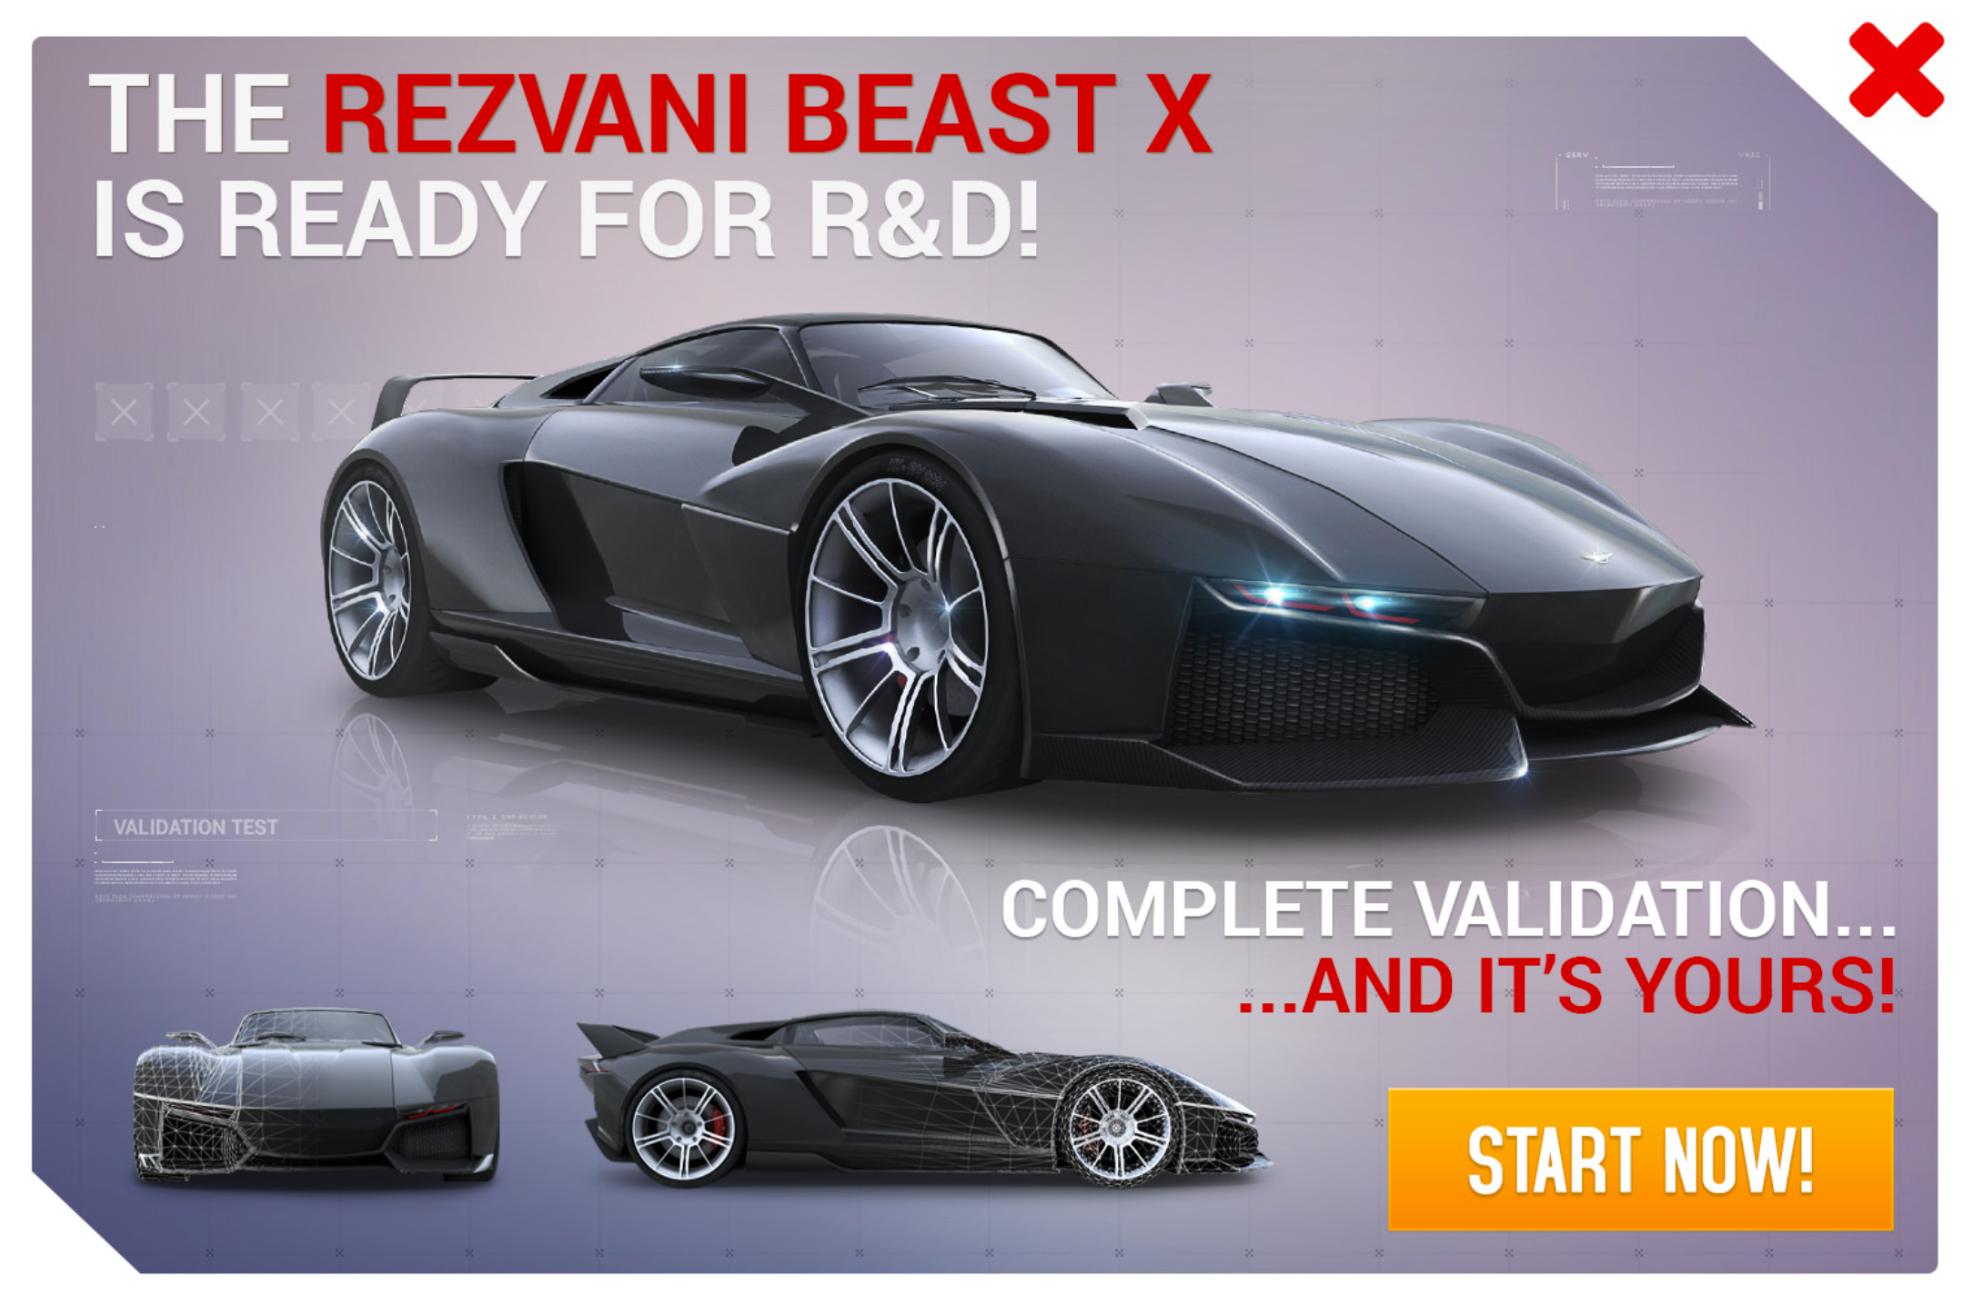 Rezvani Beast X (Research & Development)